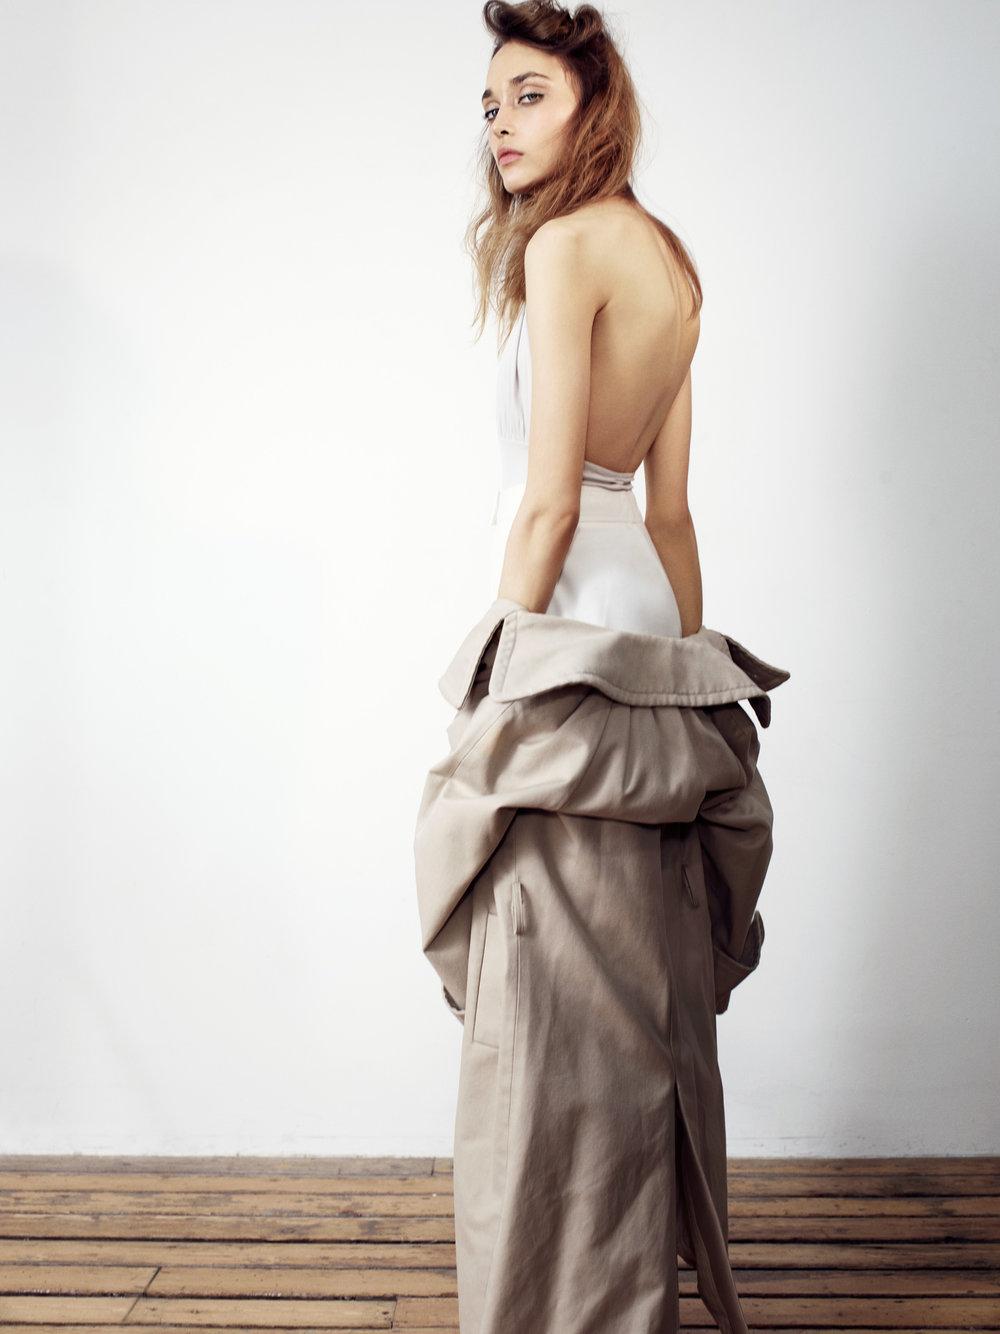 Jack_Eames_Fashion_Shot_06.jpg